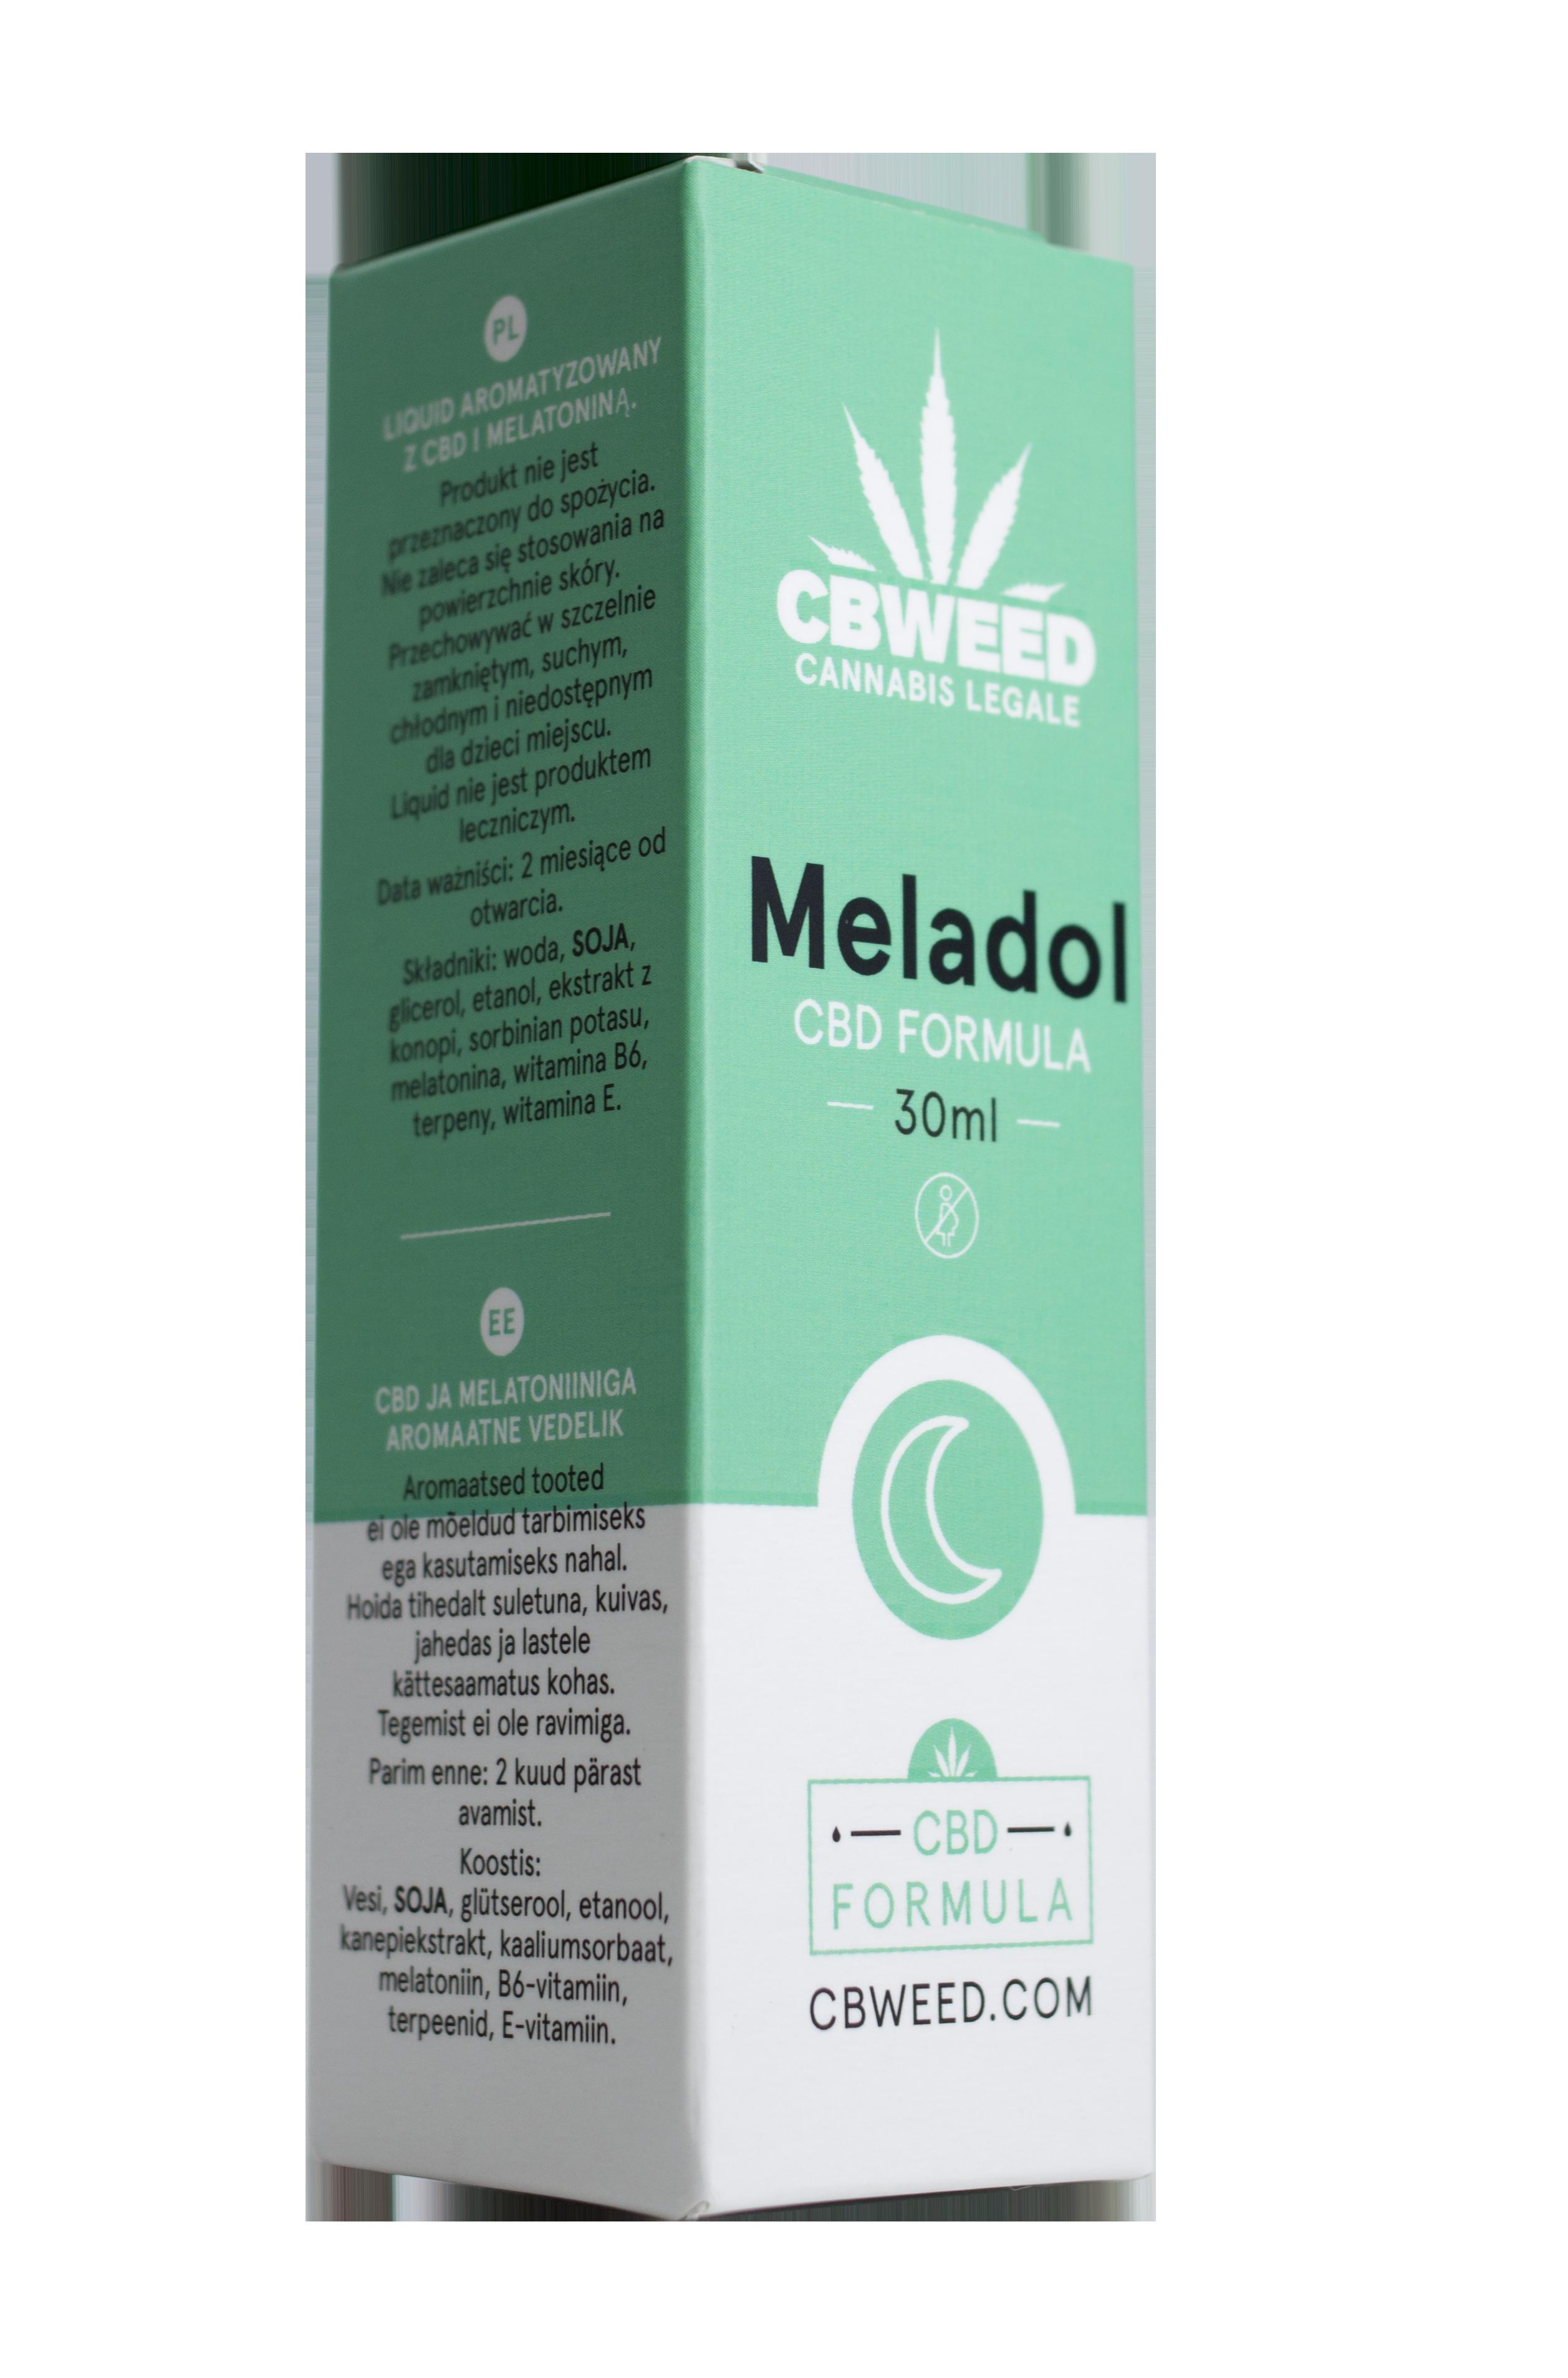 meladol - Meladol - CBD + Melatonina - Regolatore del Sonno